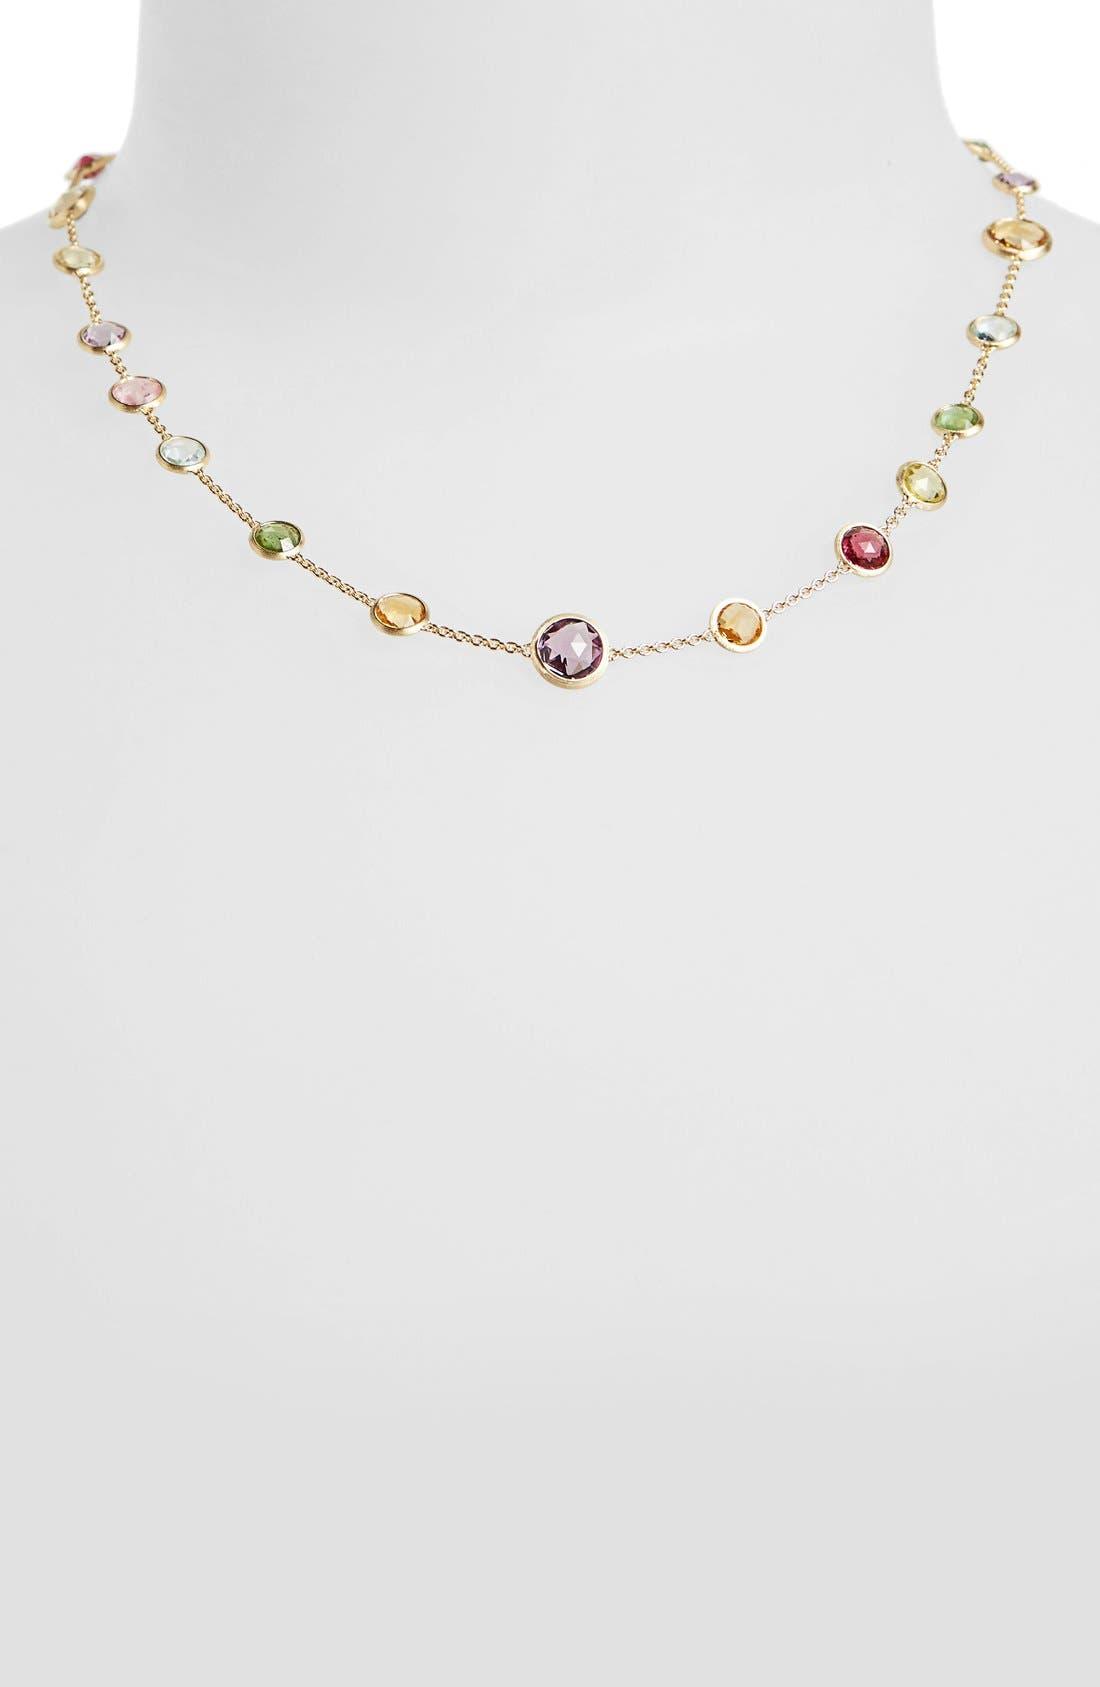 Marco Bicego 'Mini Jaipur' Station Necklace